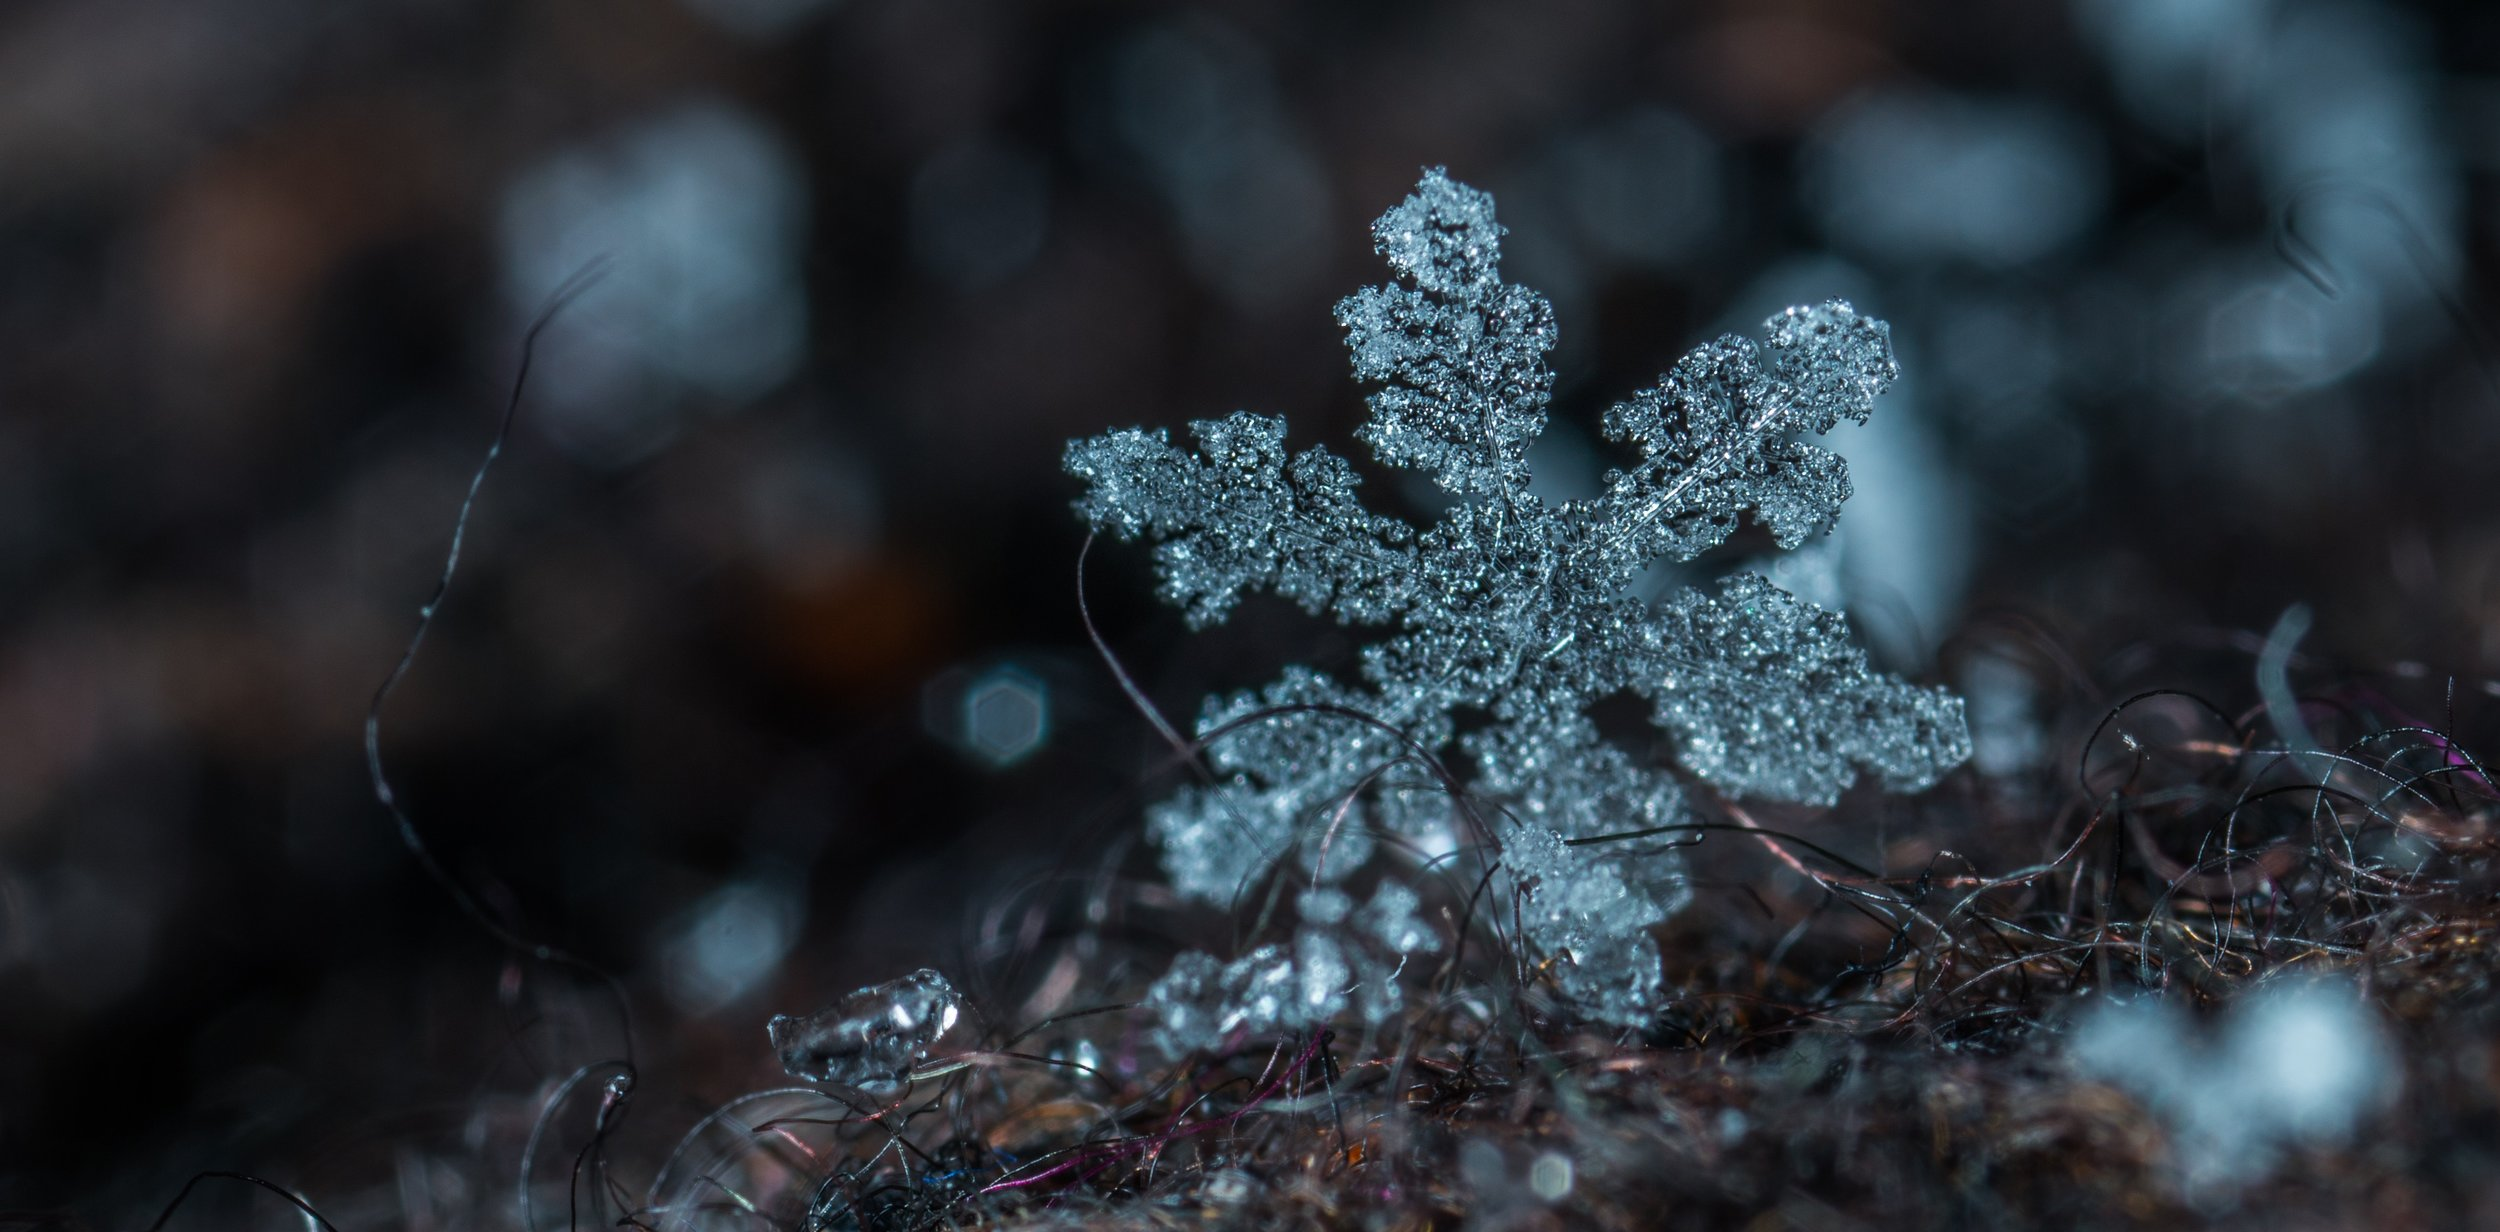 blur-close-up-cold-813870.jpg